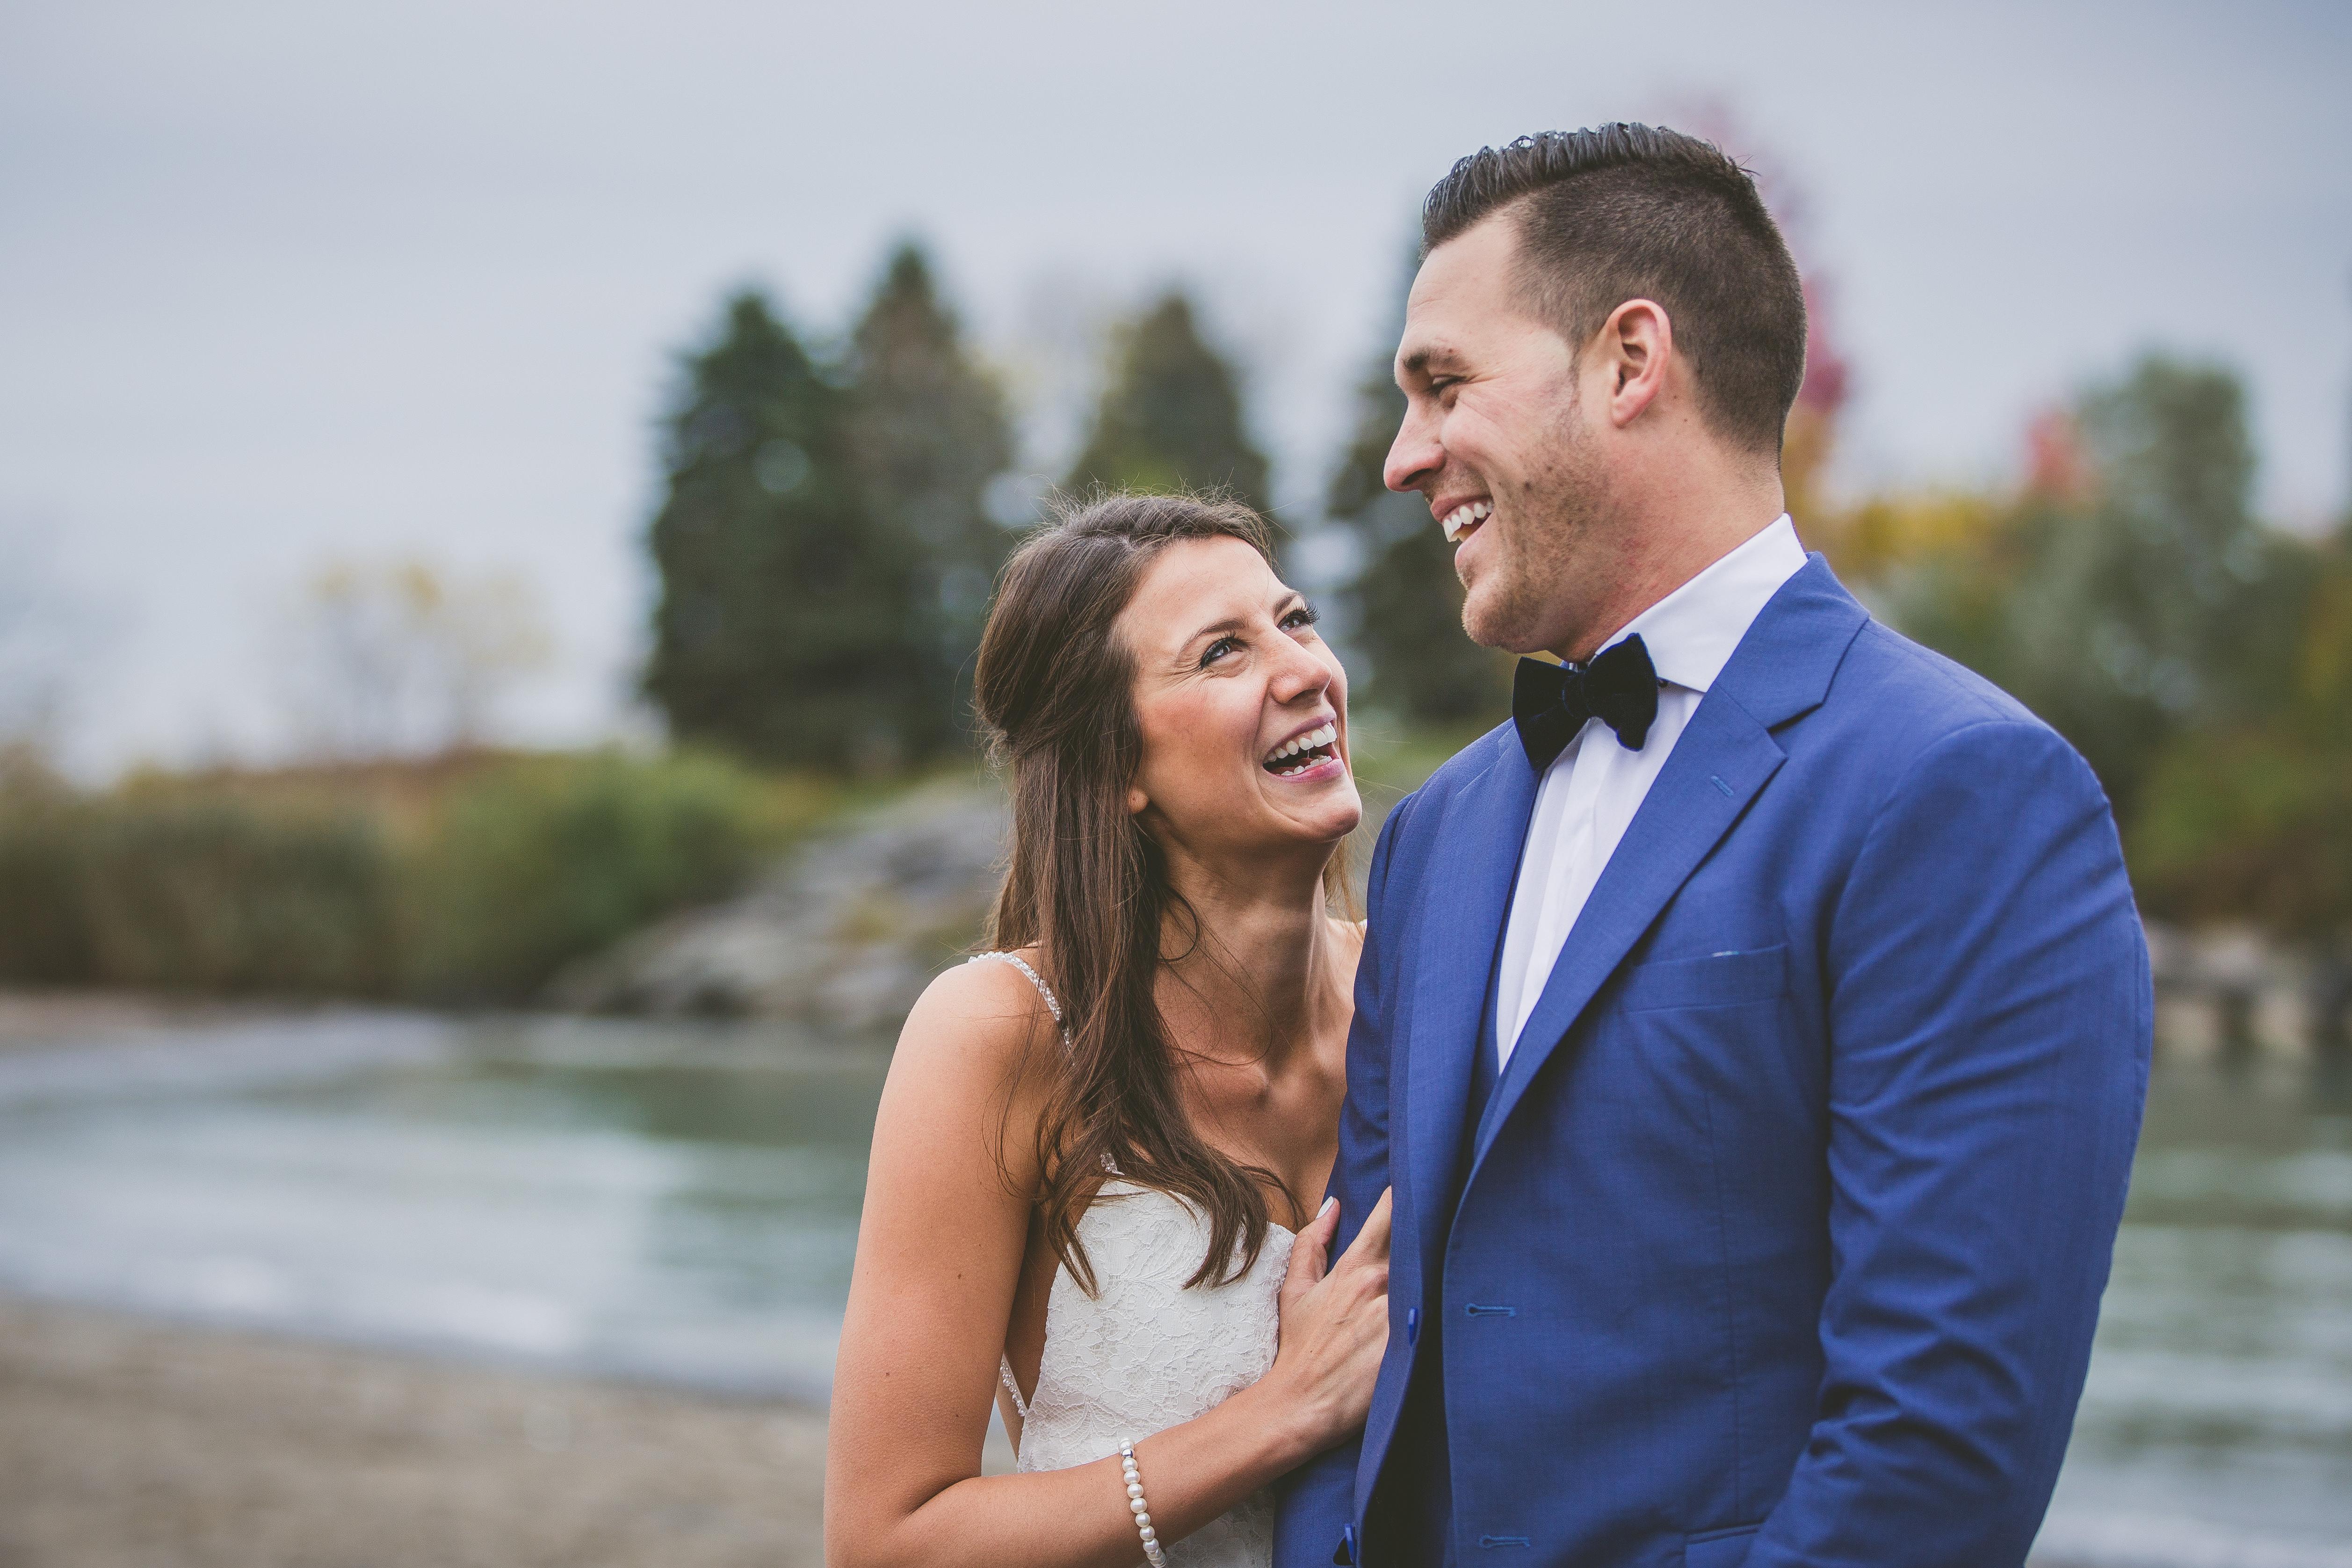 scarborough bluffs wedding photos 28 - Scarborough Bluffs Wedding Photos